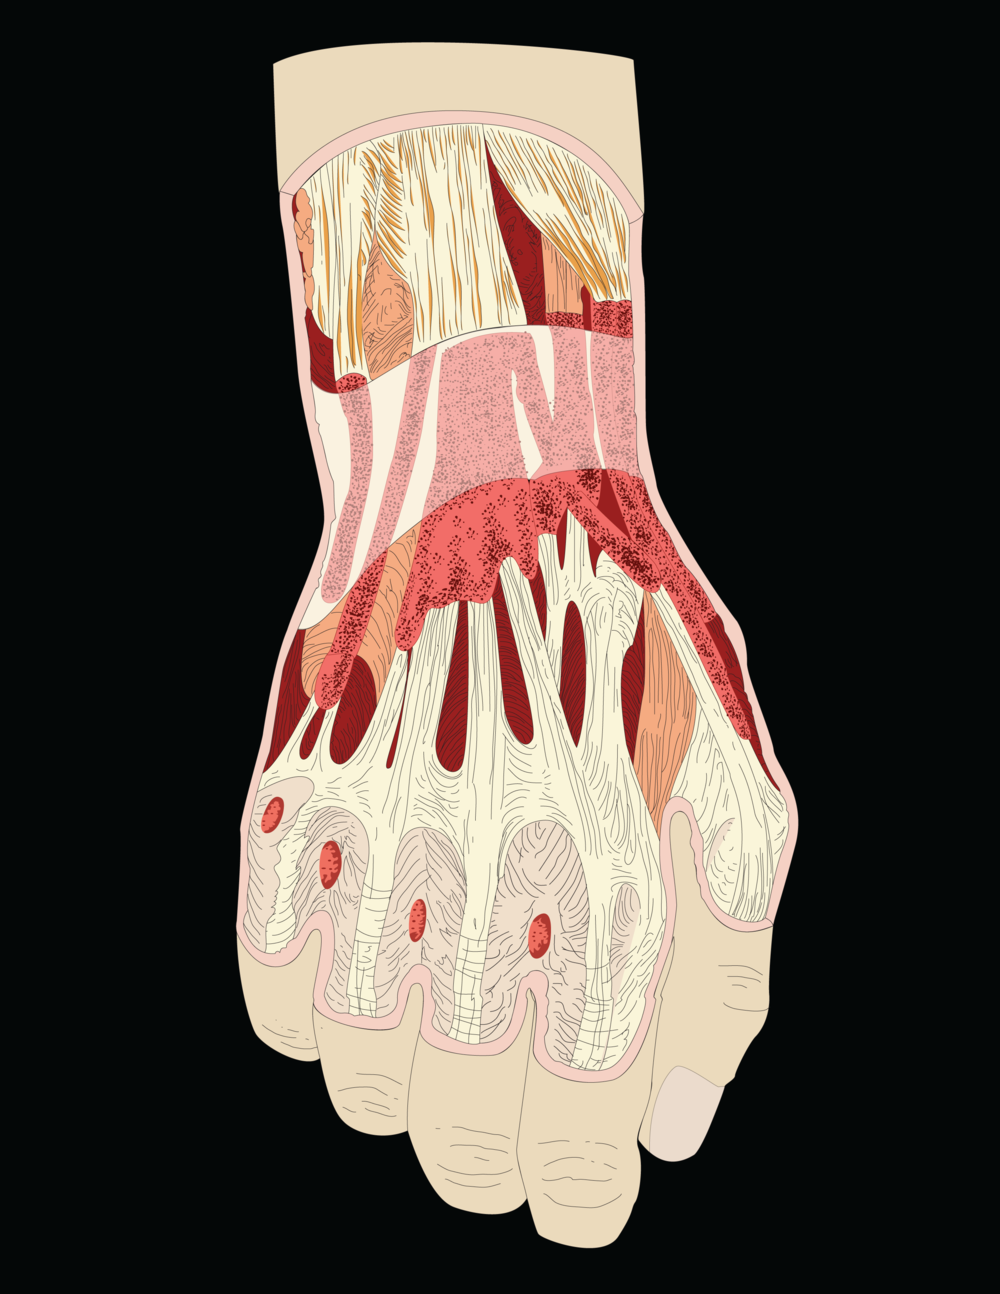 Interior of Hand